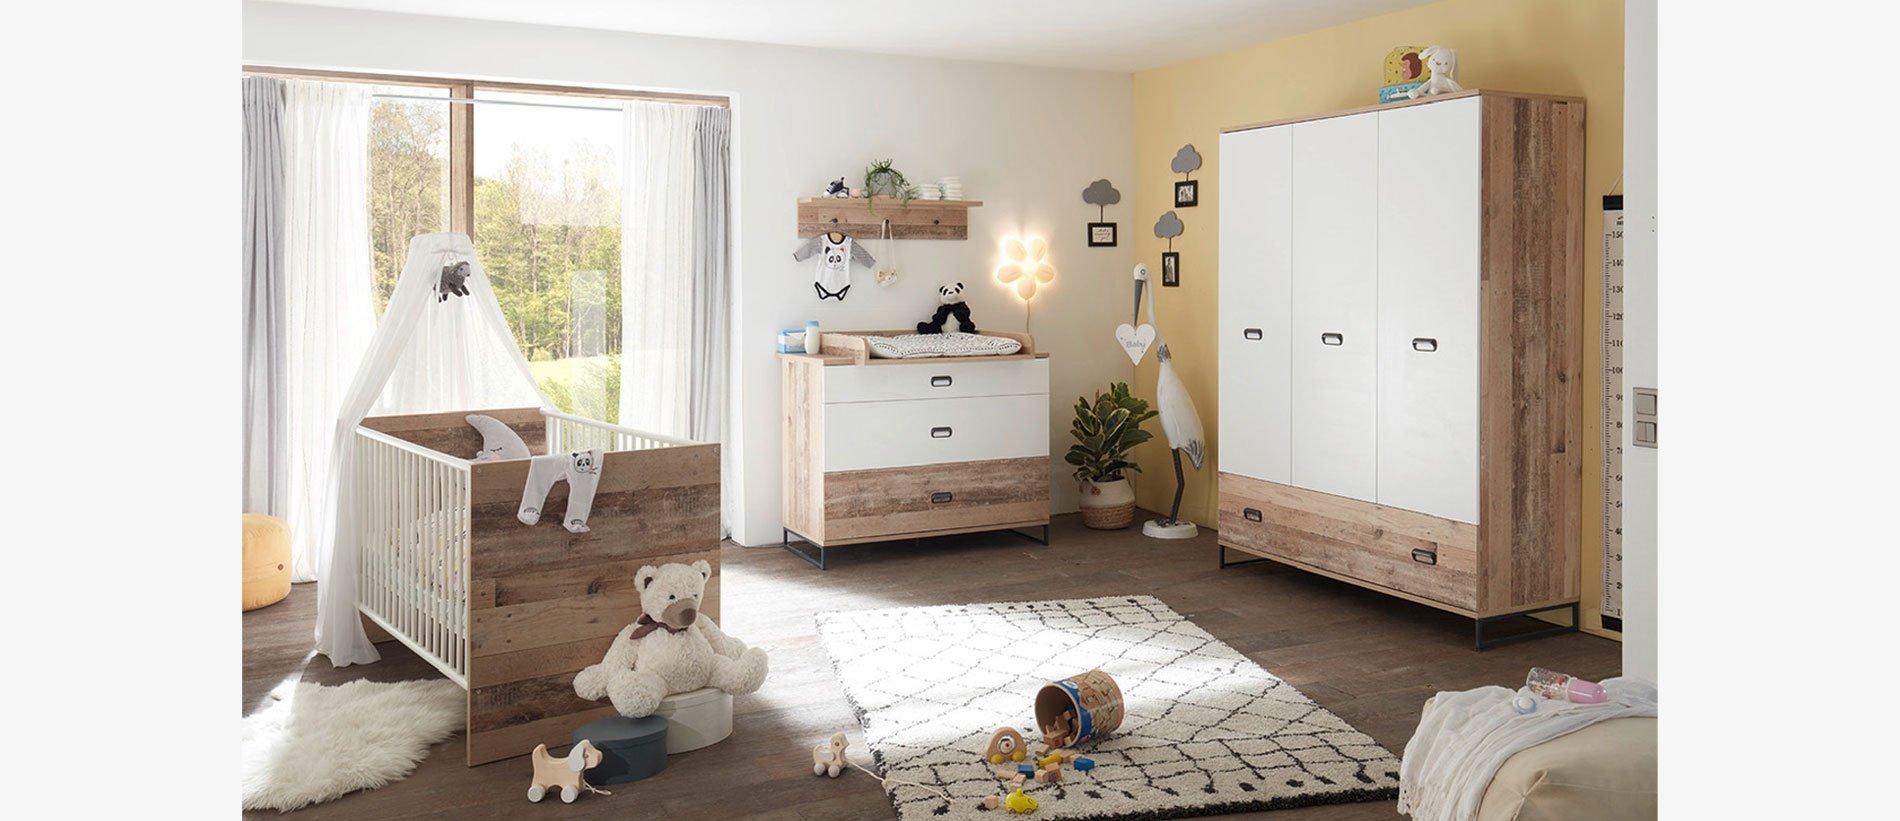 Begabino-Babyzimmer-a